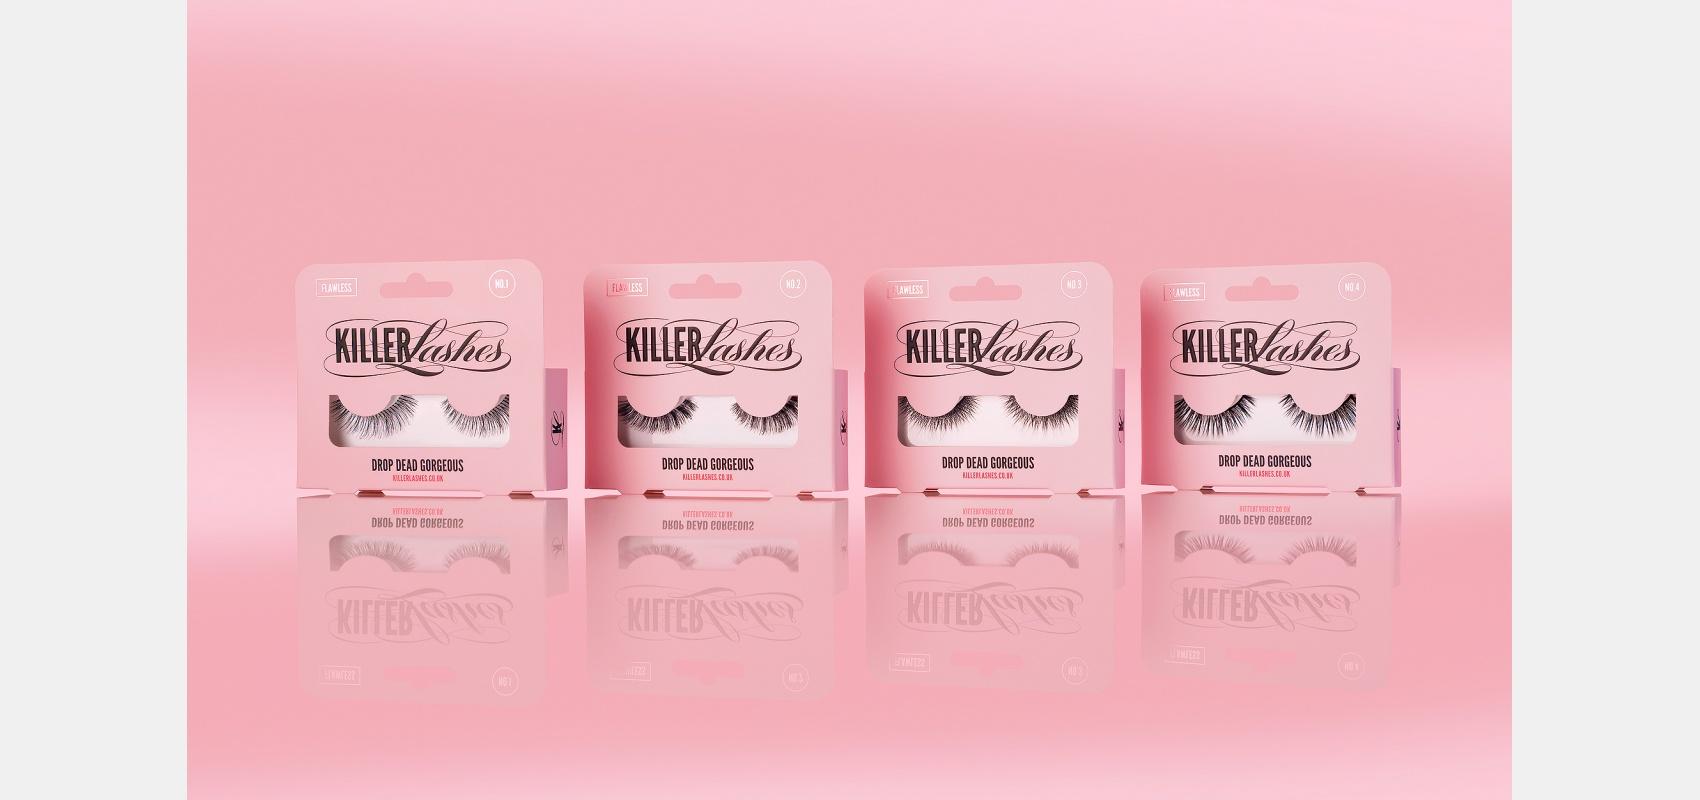 Product photography/Cosmetics/Launch image new lashes range.